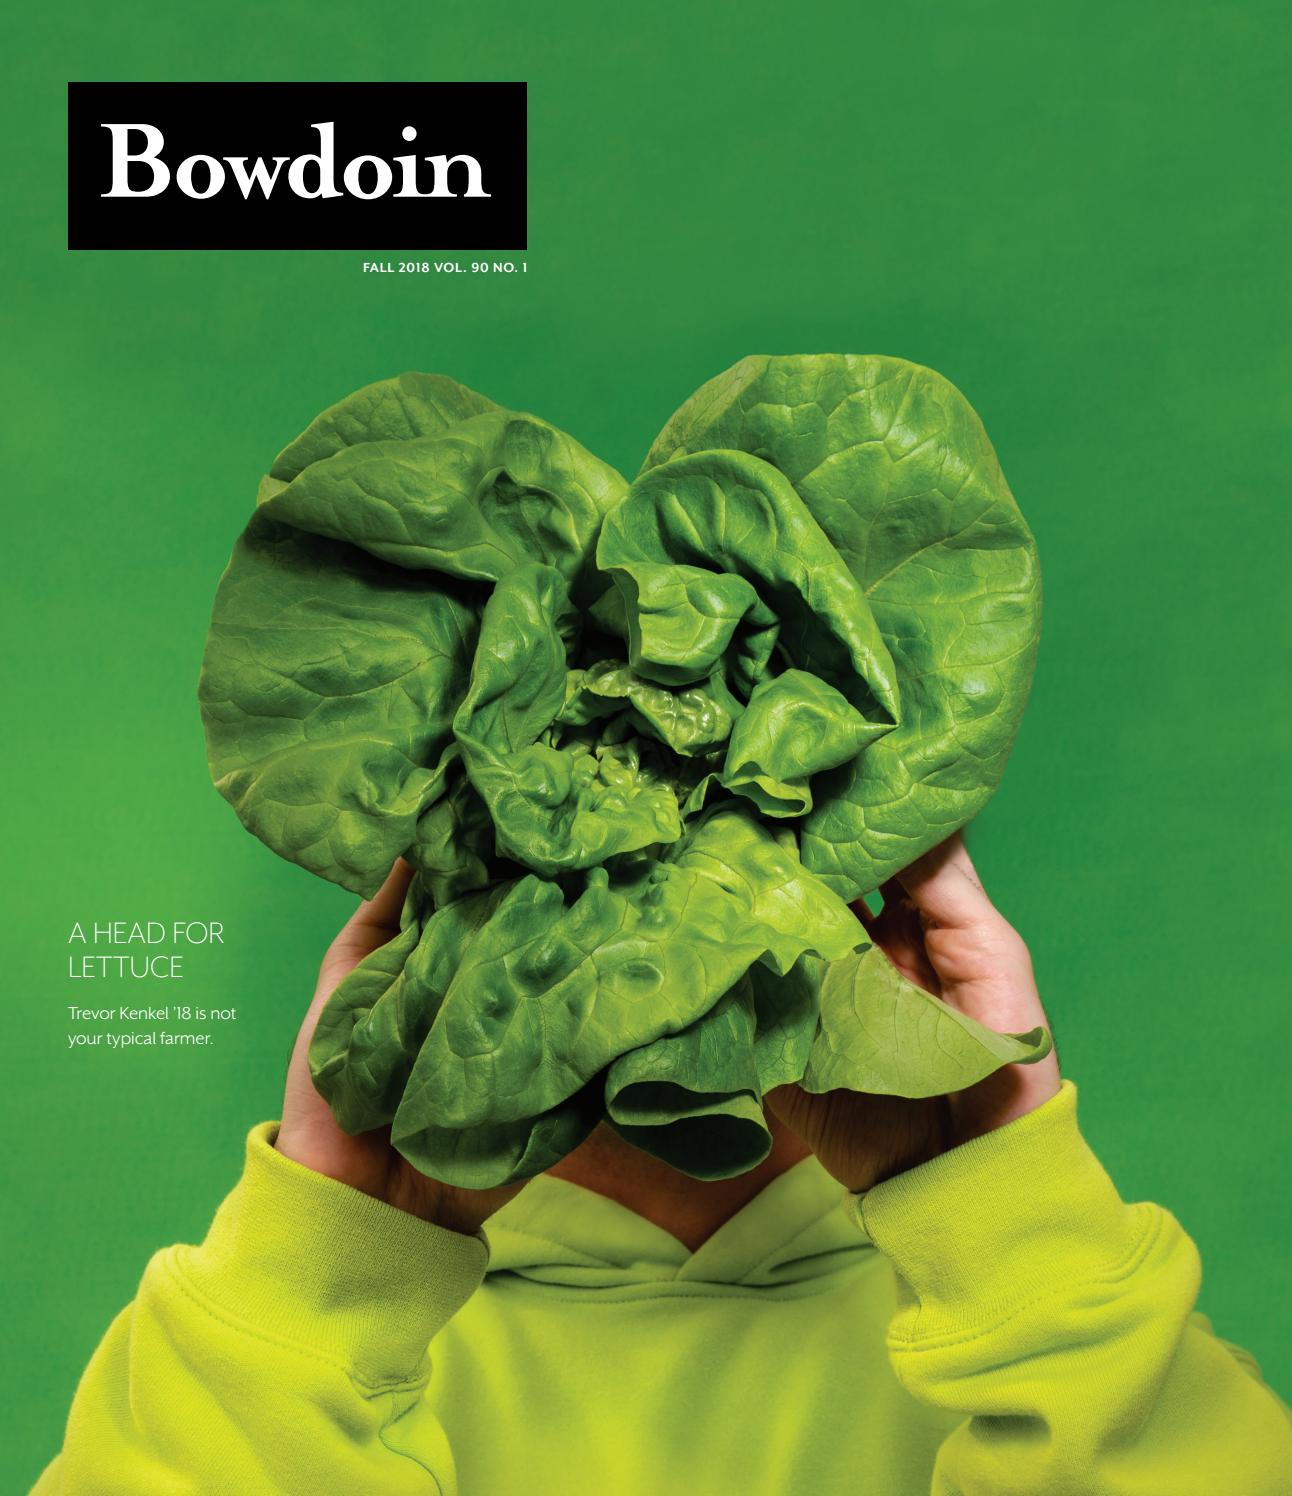 Bowdoin Magazine Vol 90 No 1 Fall 2018 By Bowdoin Magazine Issuu